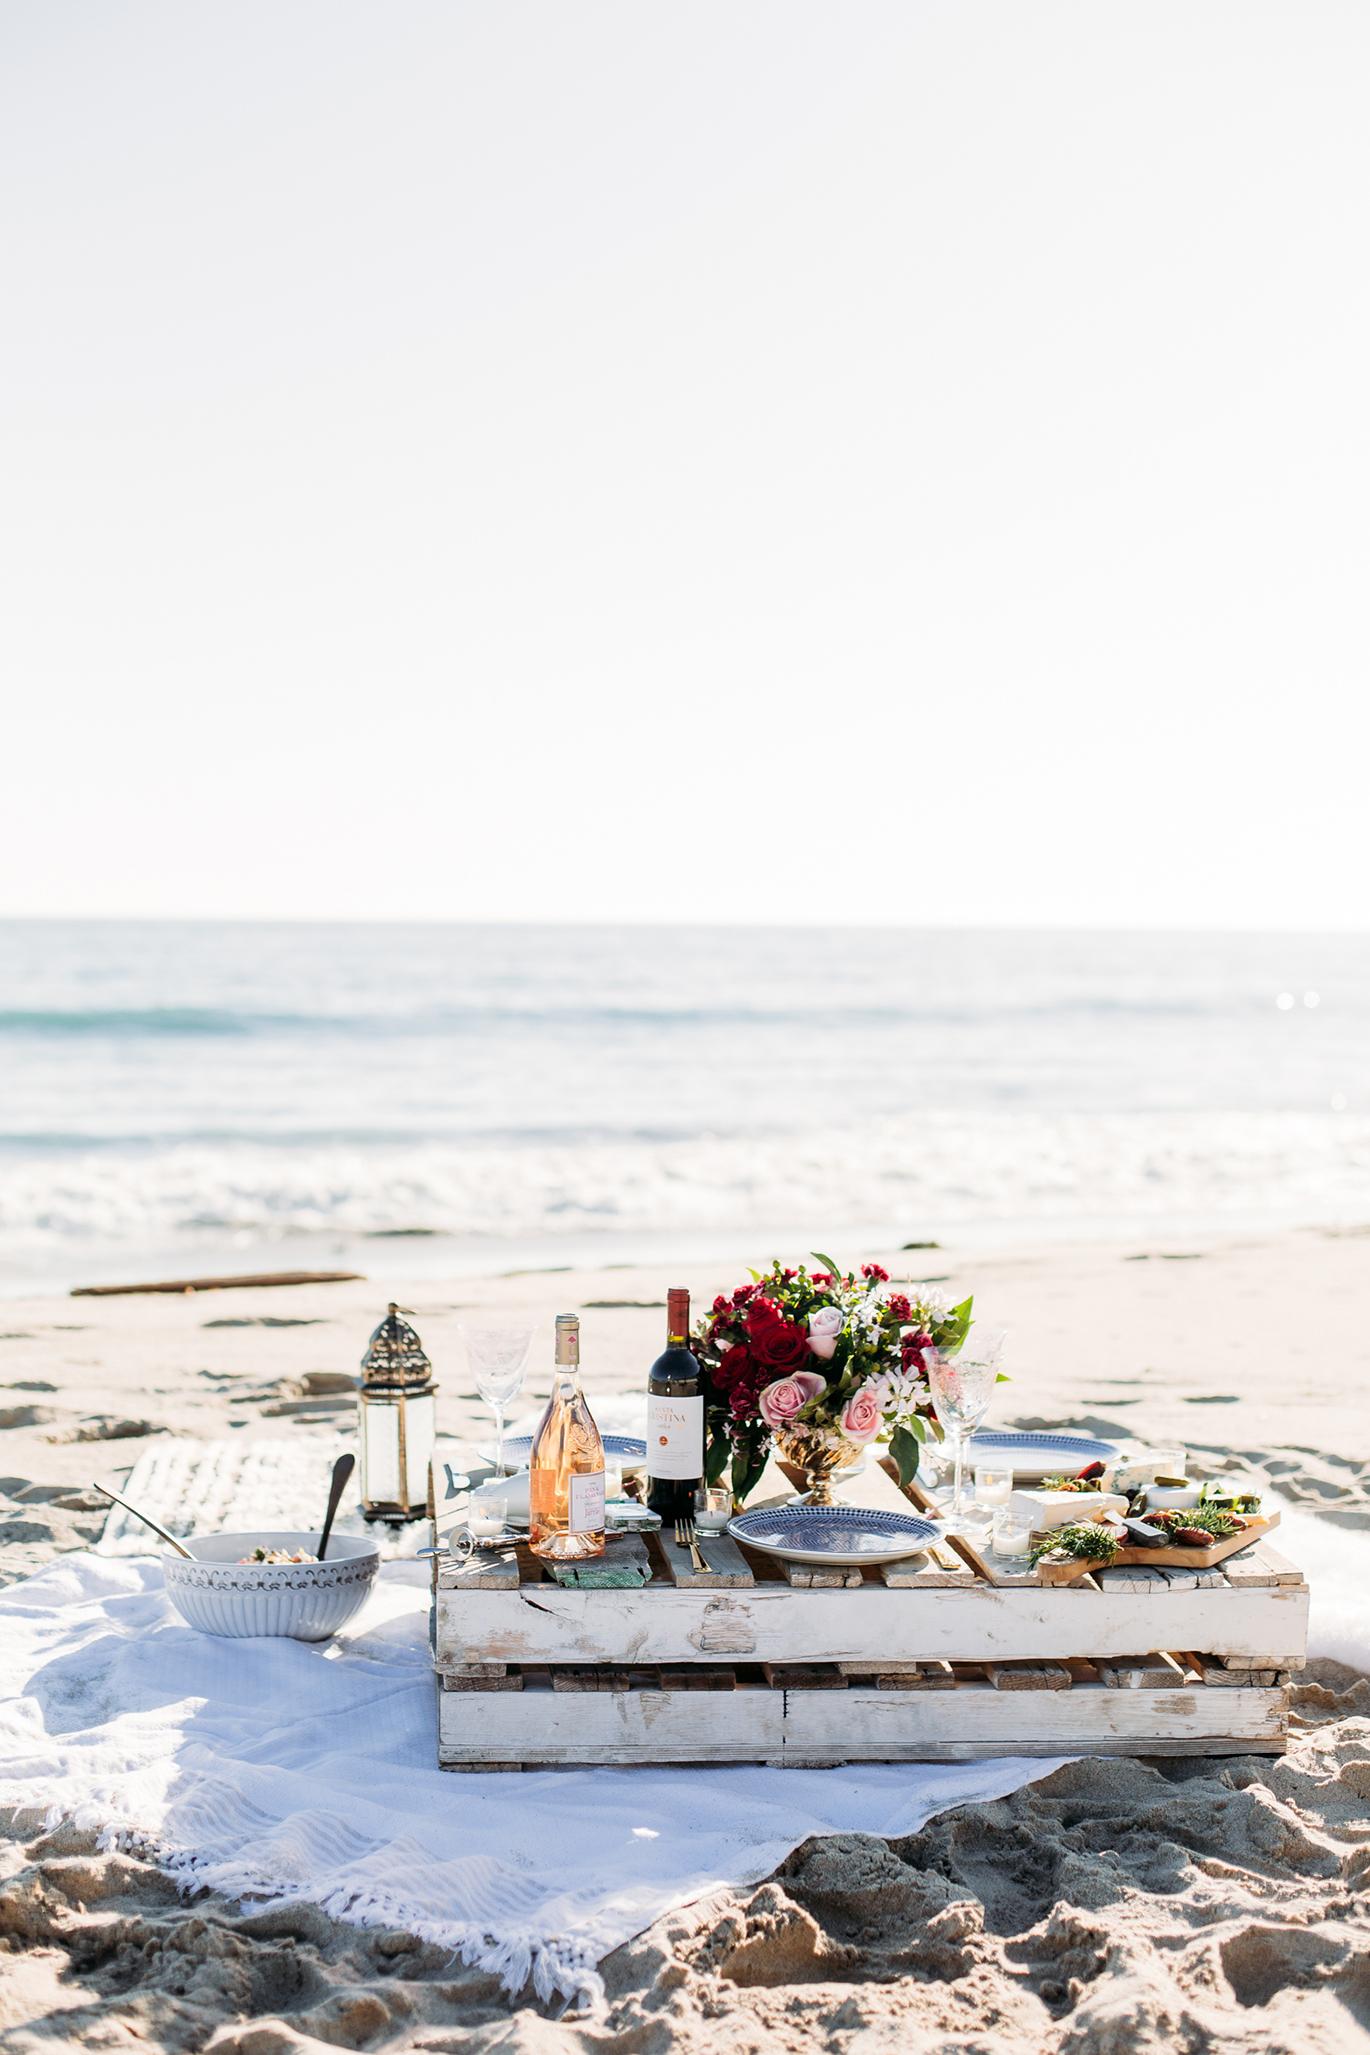 How to throw a beach picnic